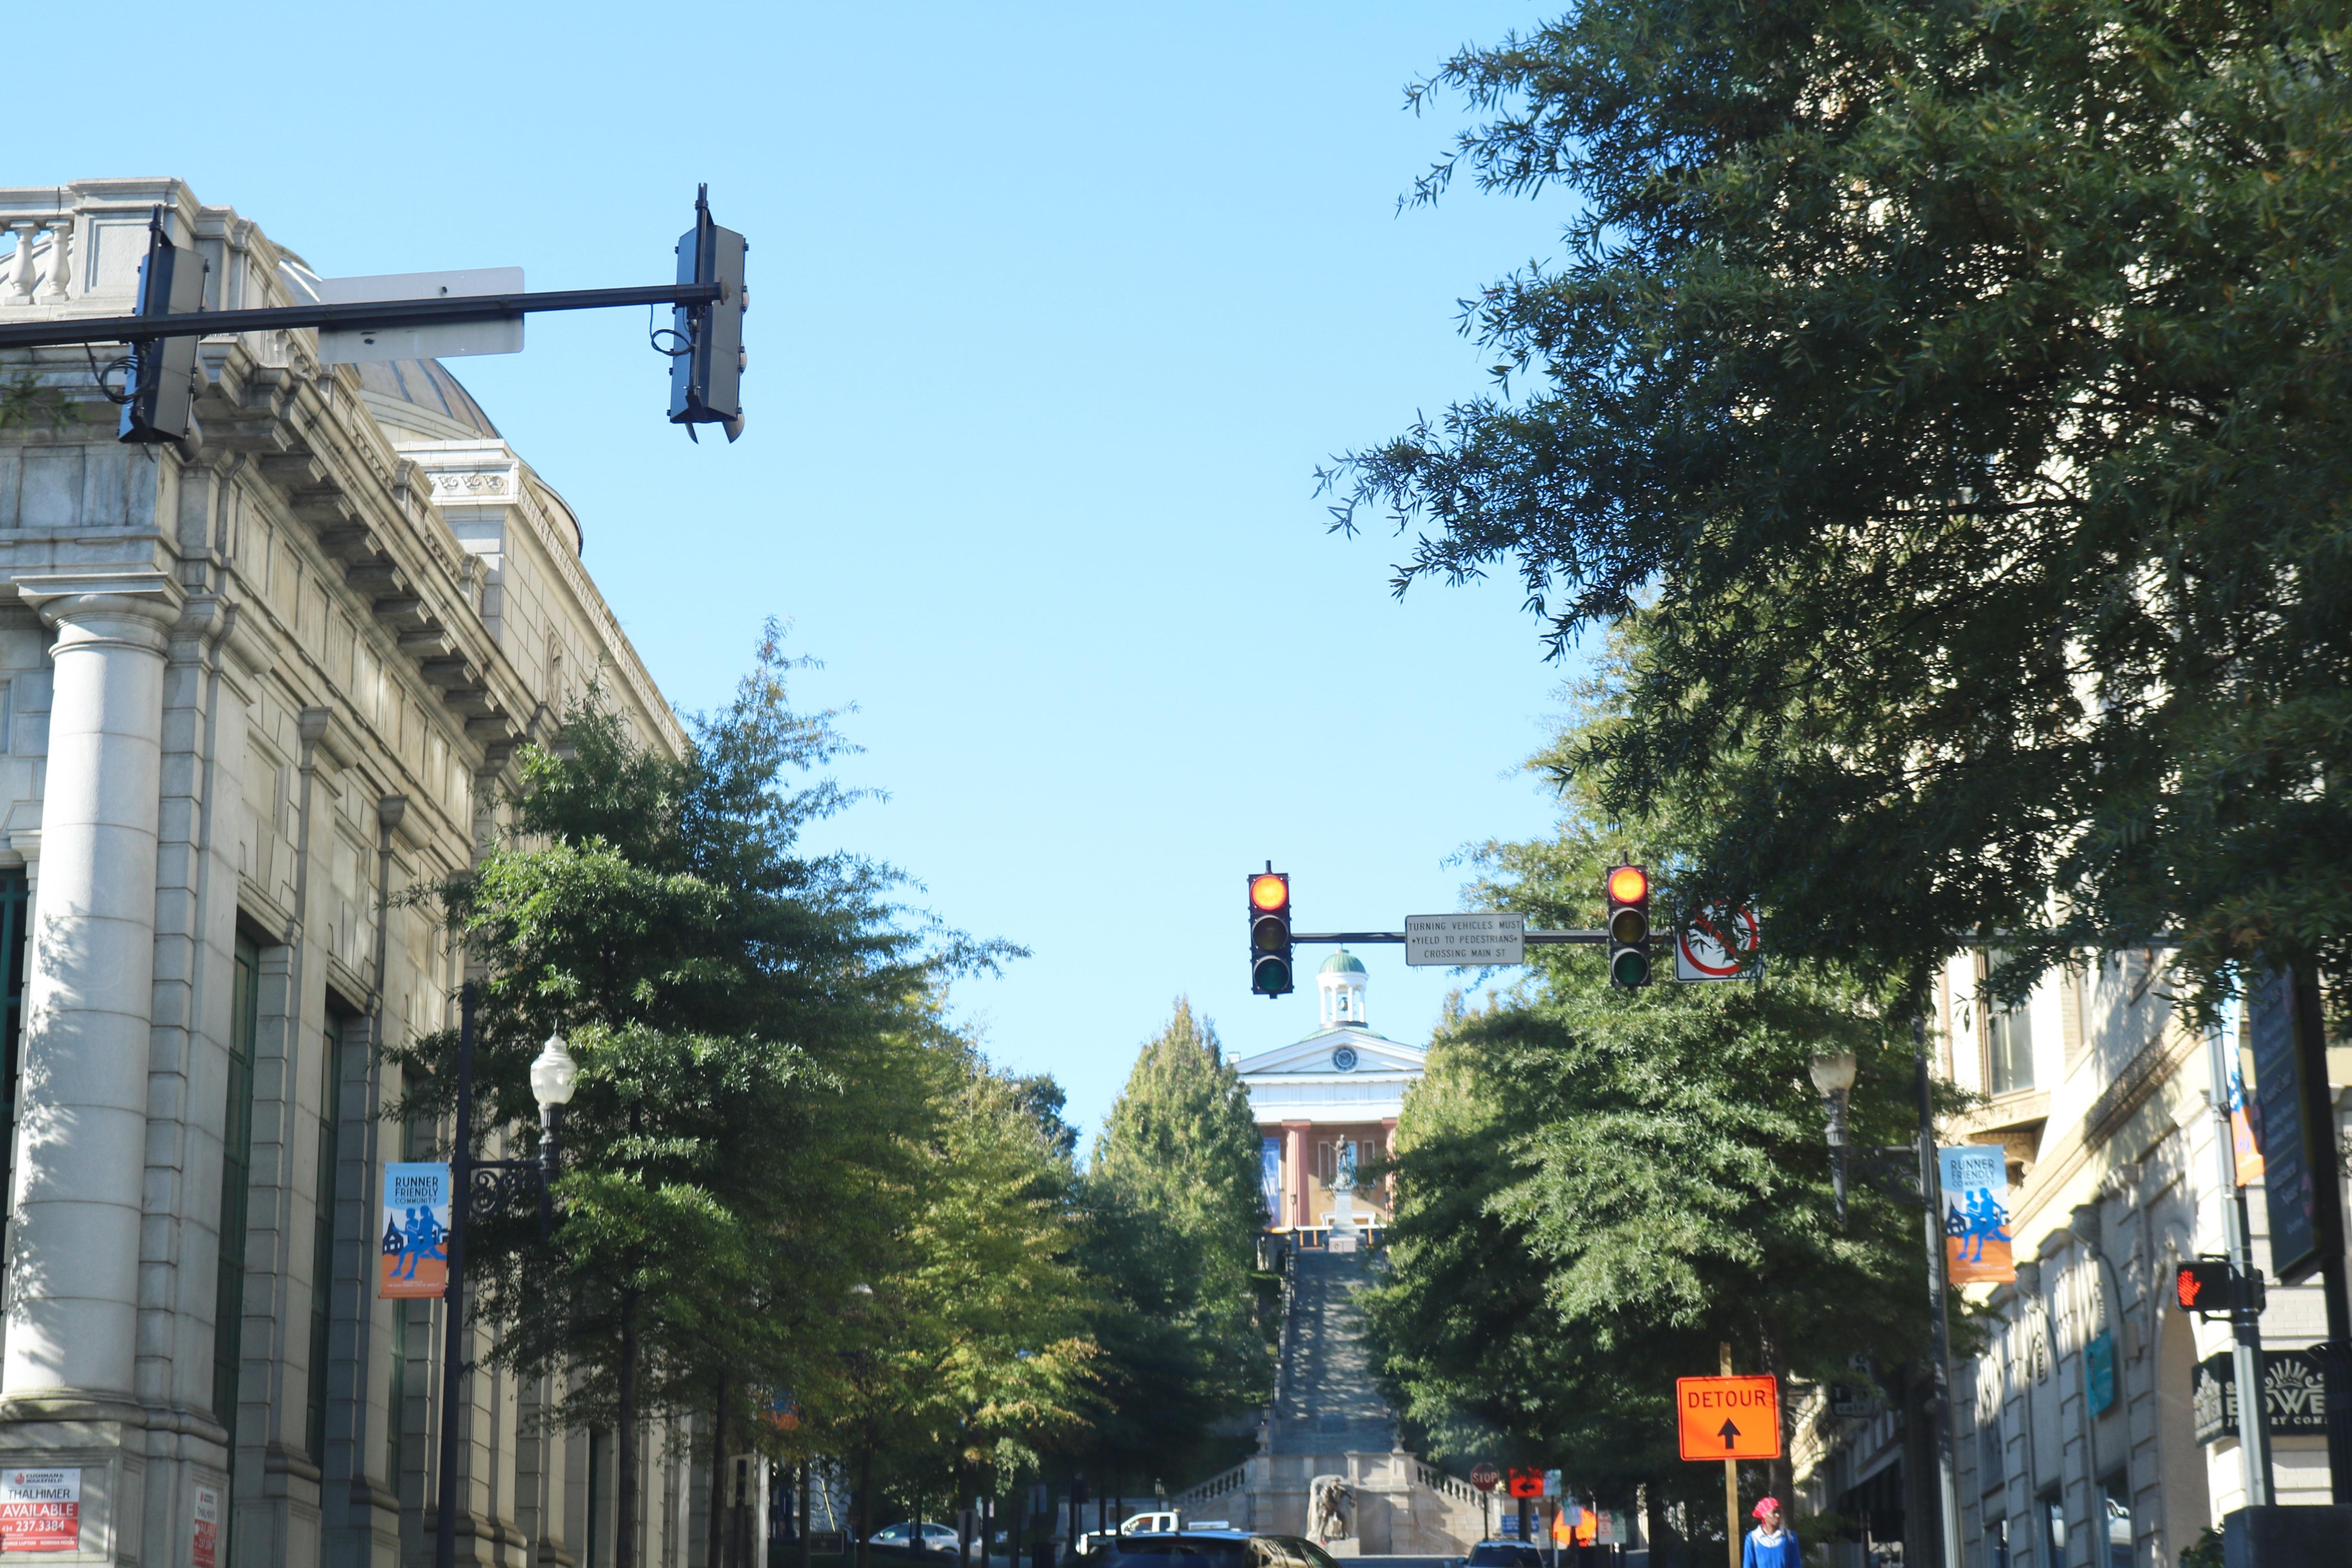 Visiting Chase's hometown: Lynchburg, VA!